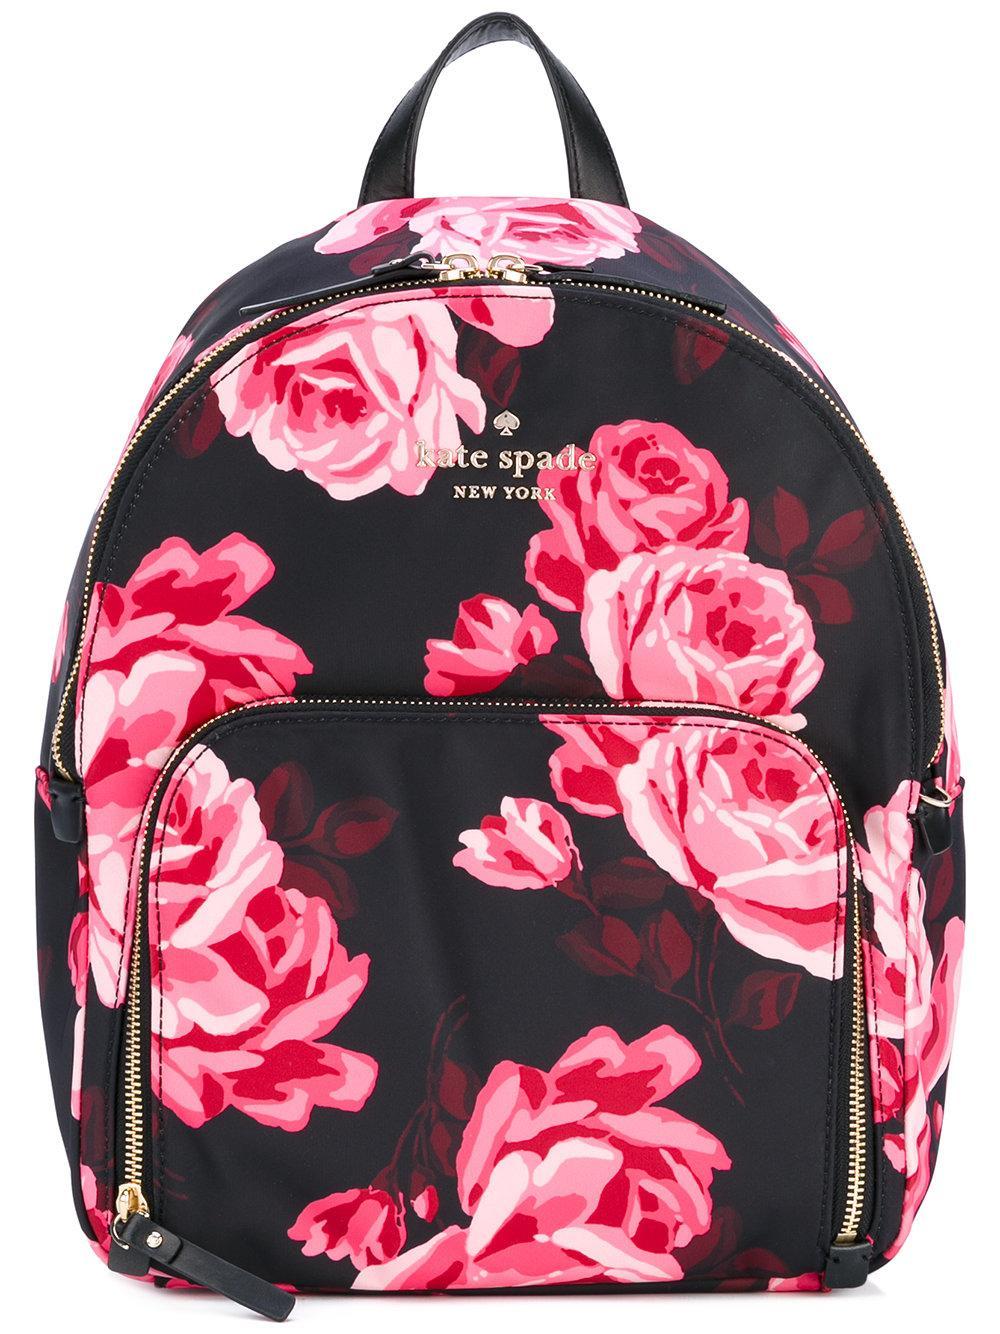 Kate spade new york Floral Print Backpack in Black